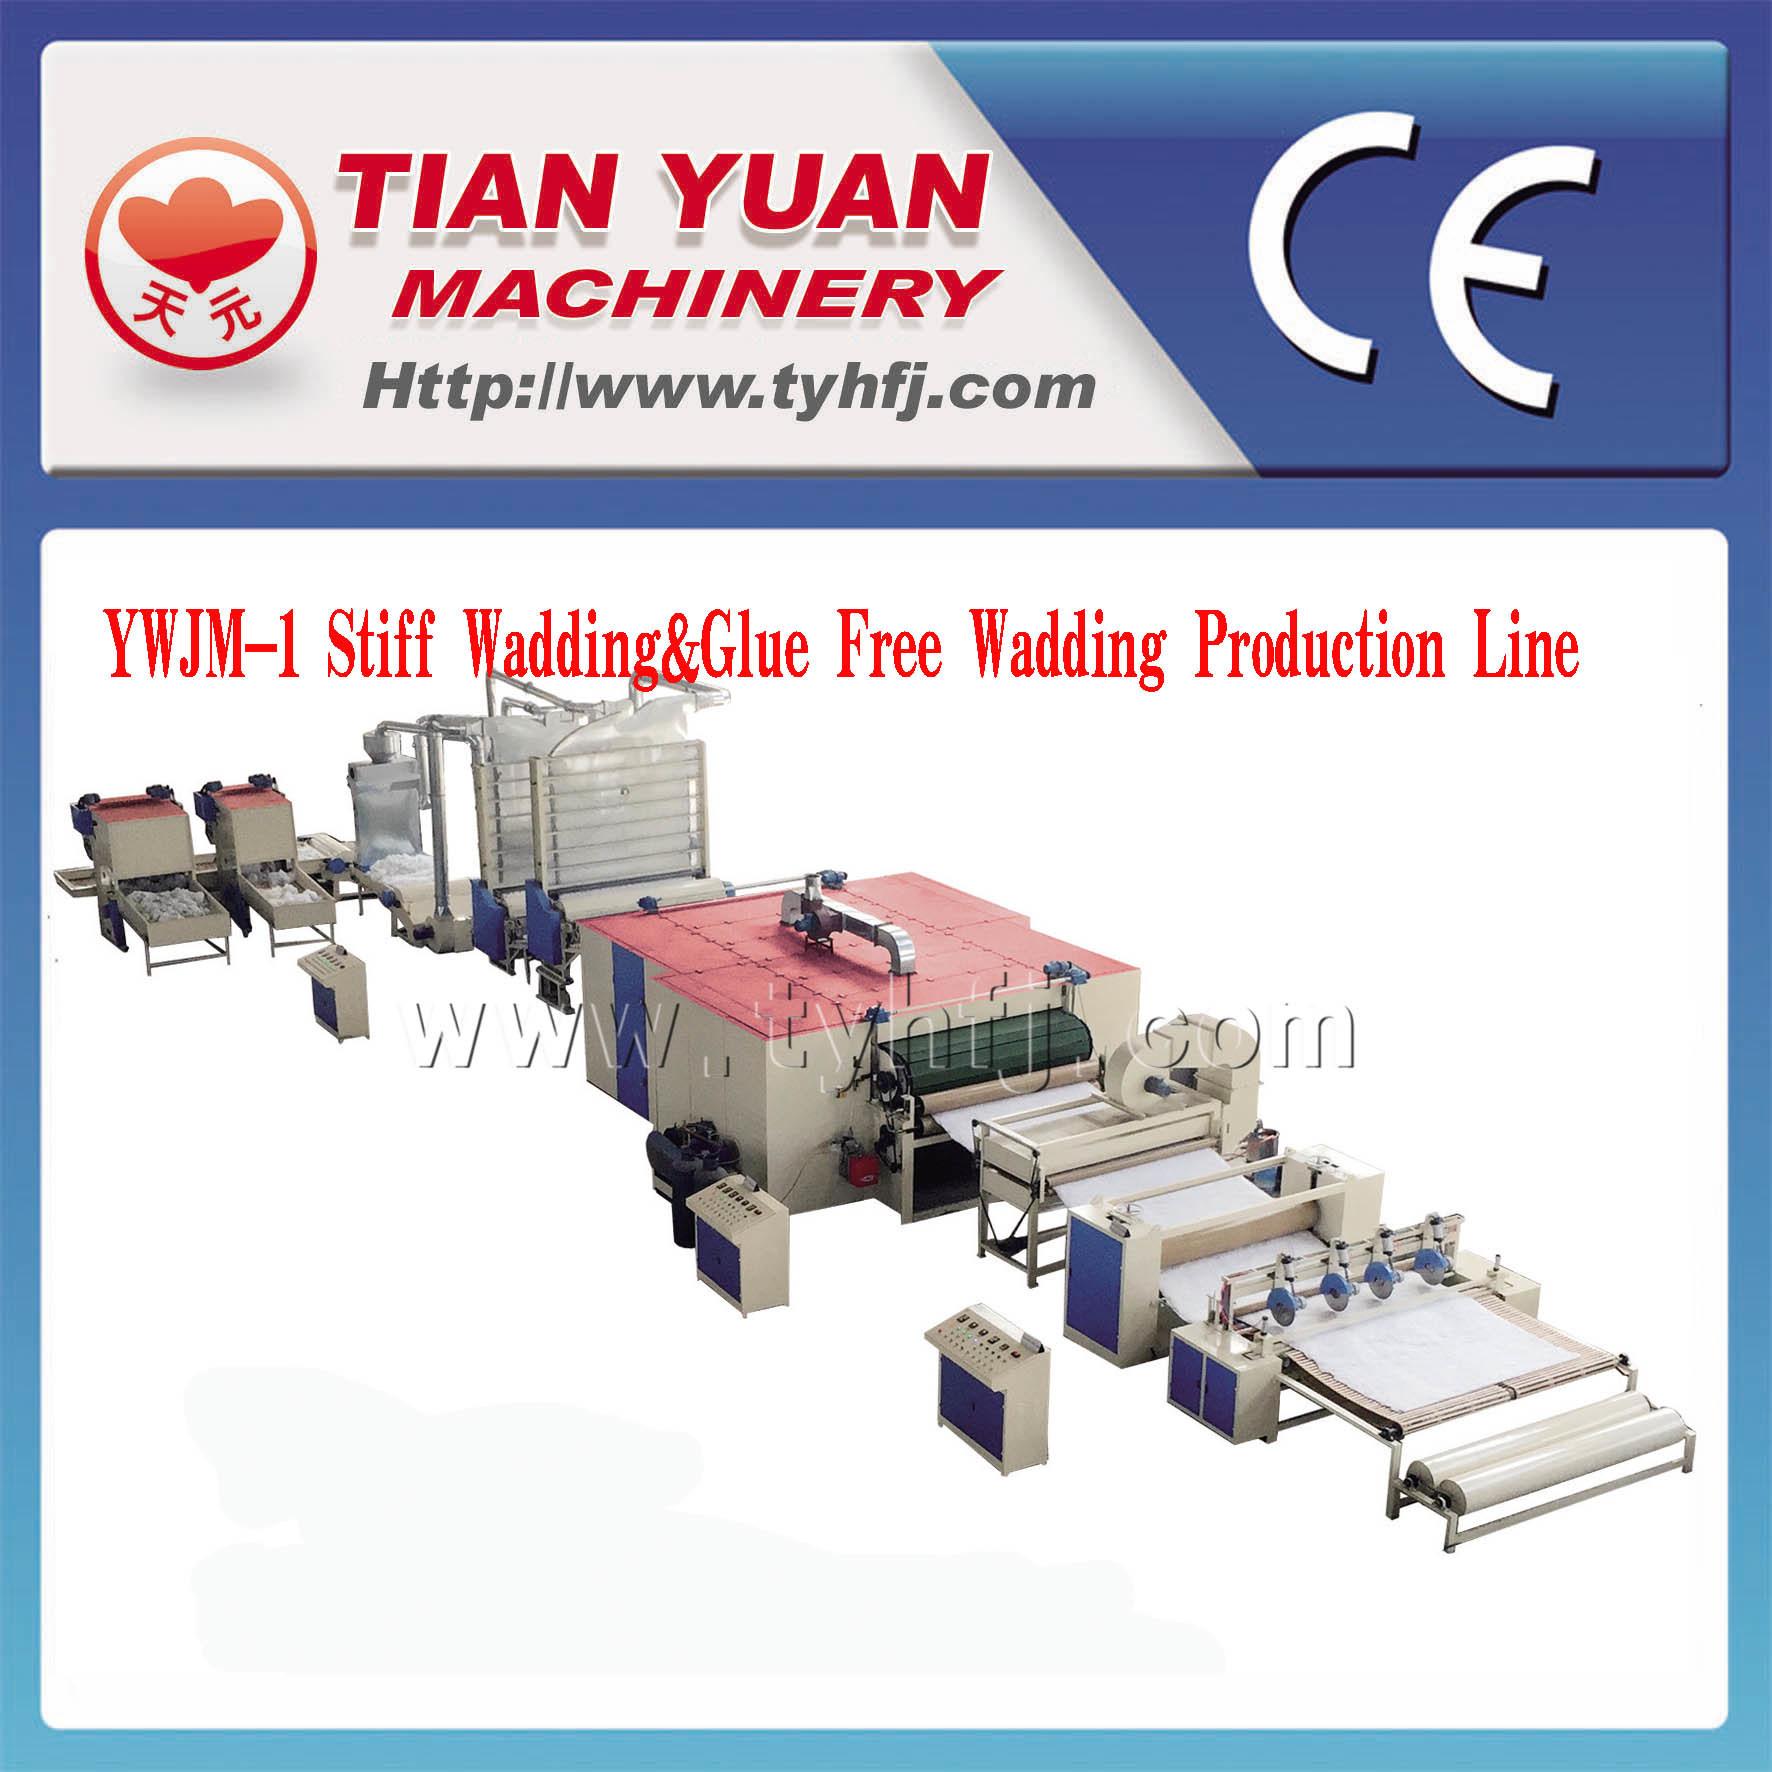 Nonwoven Machinery/Stiff Wadding Line/Glue Free Wadding Line